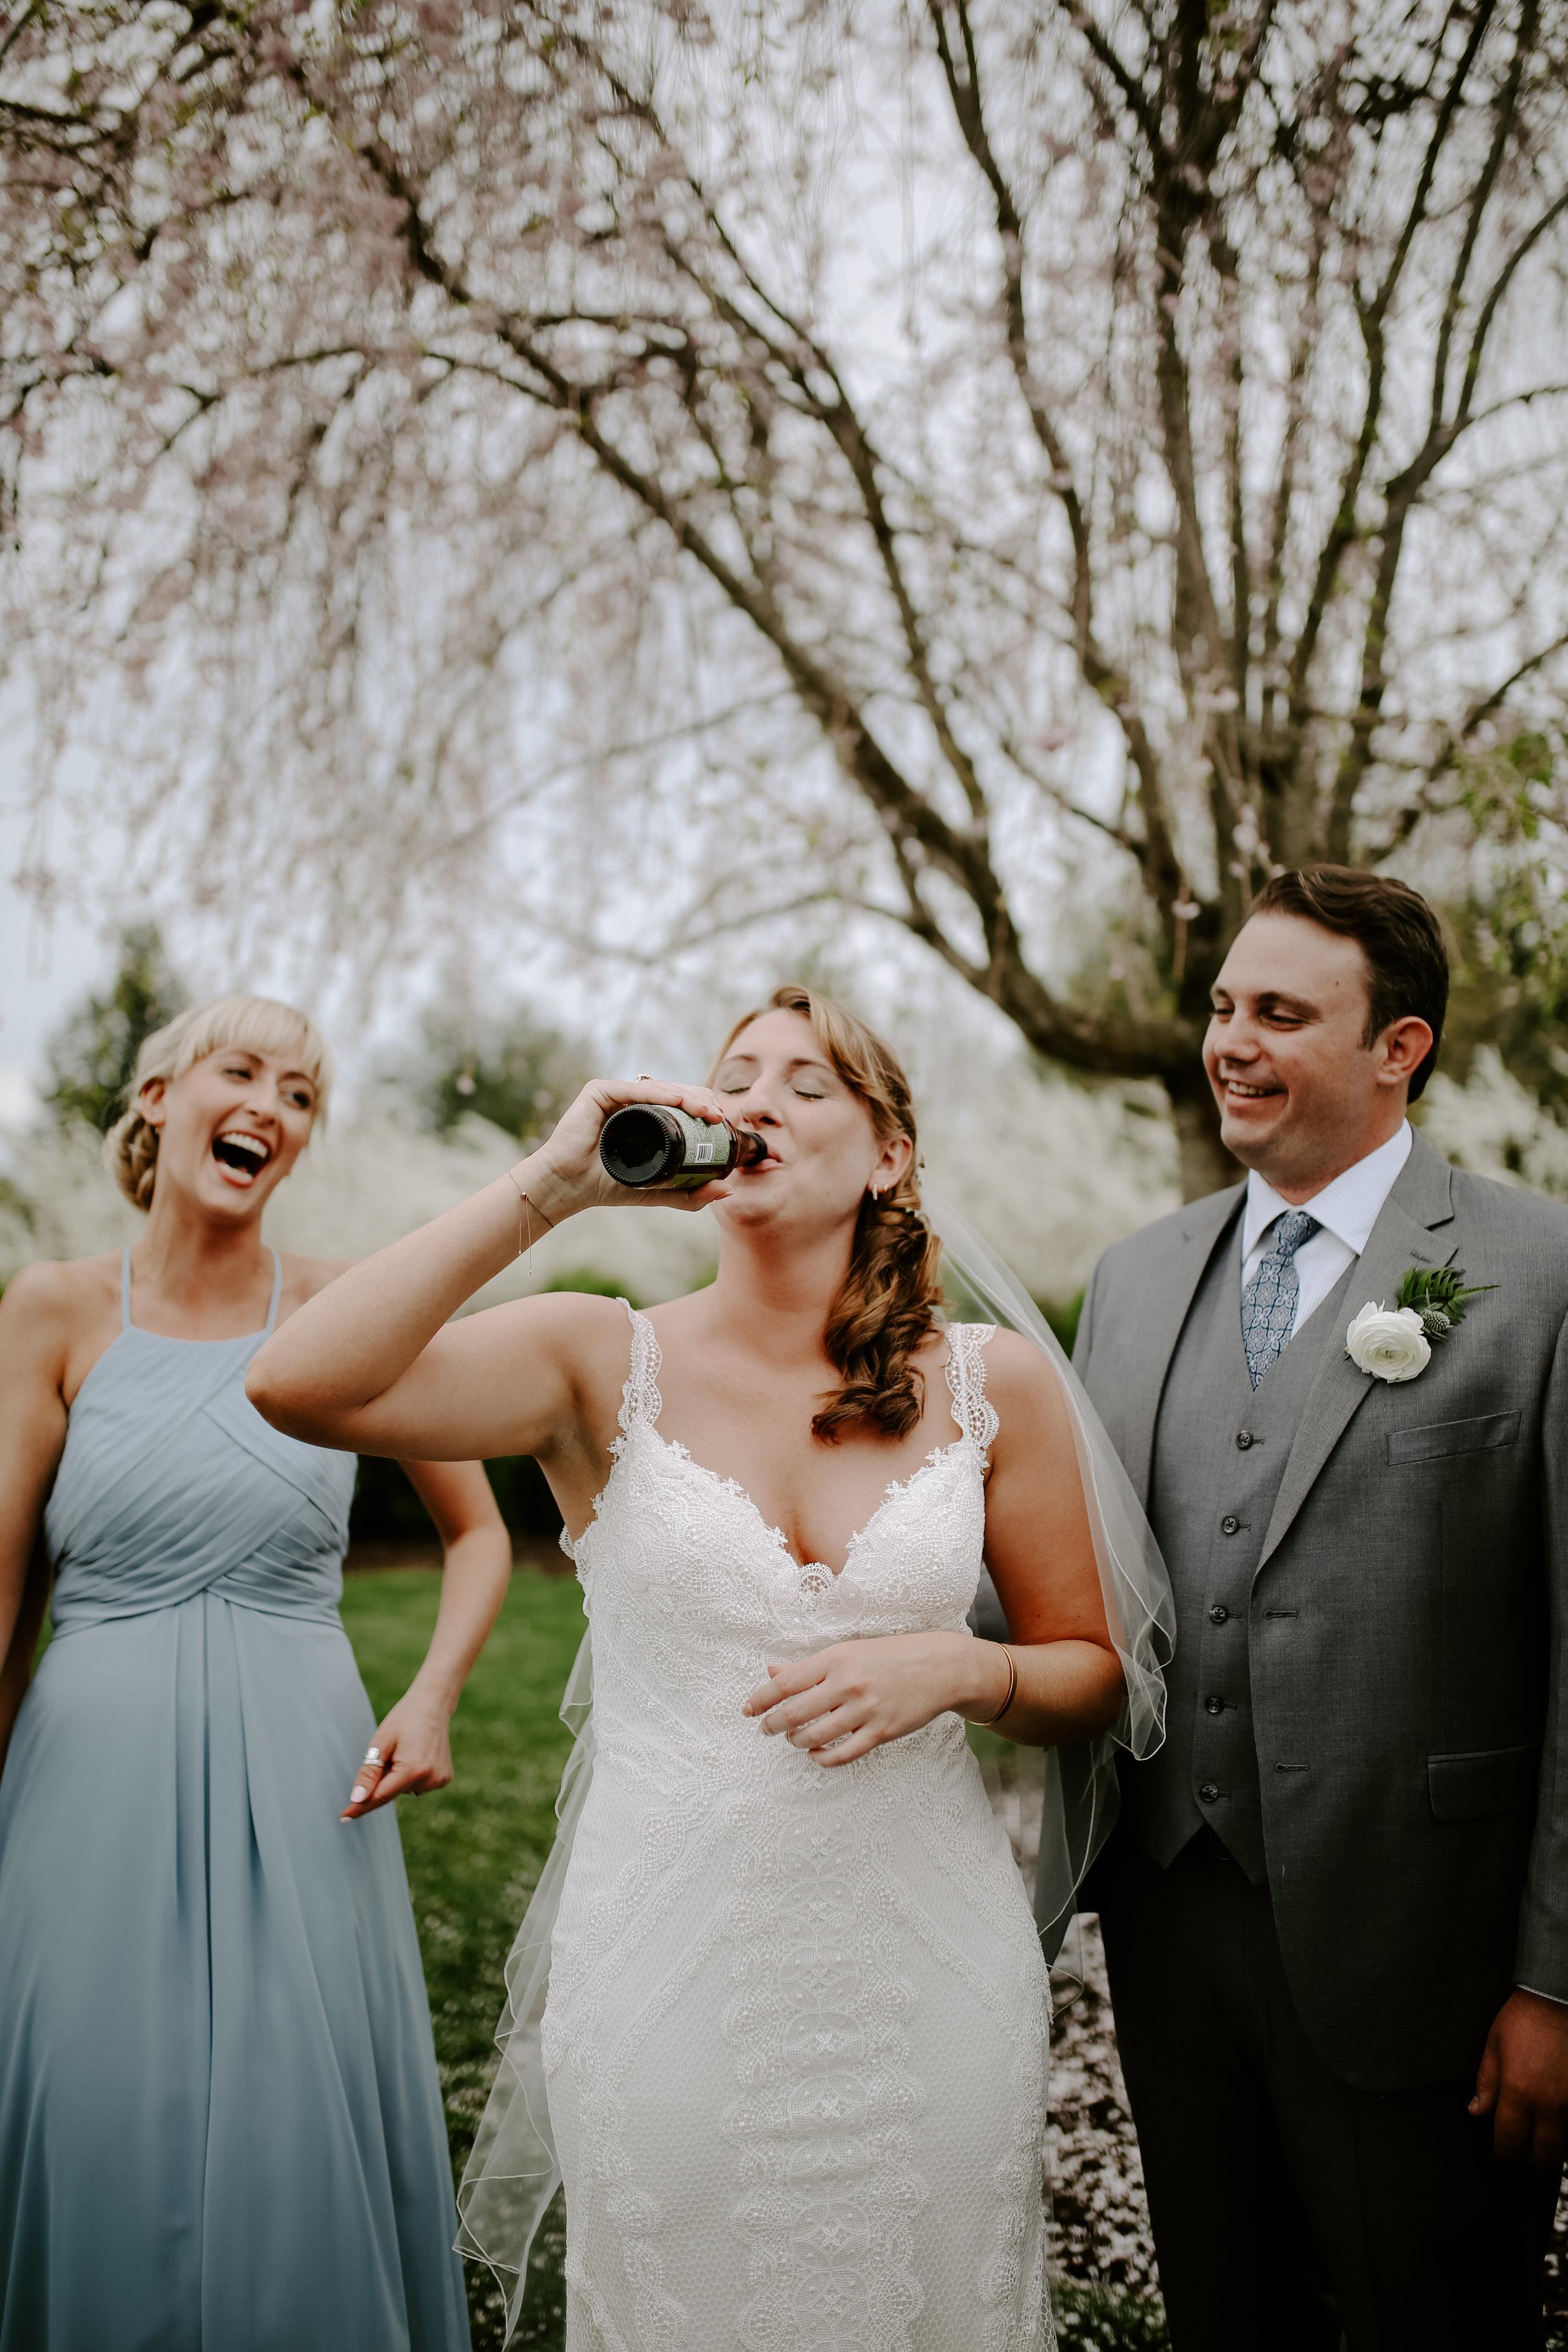 TheGreens_Married_2019-127.jpg